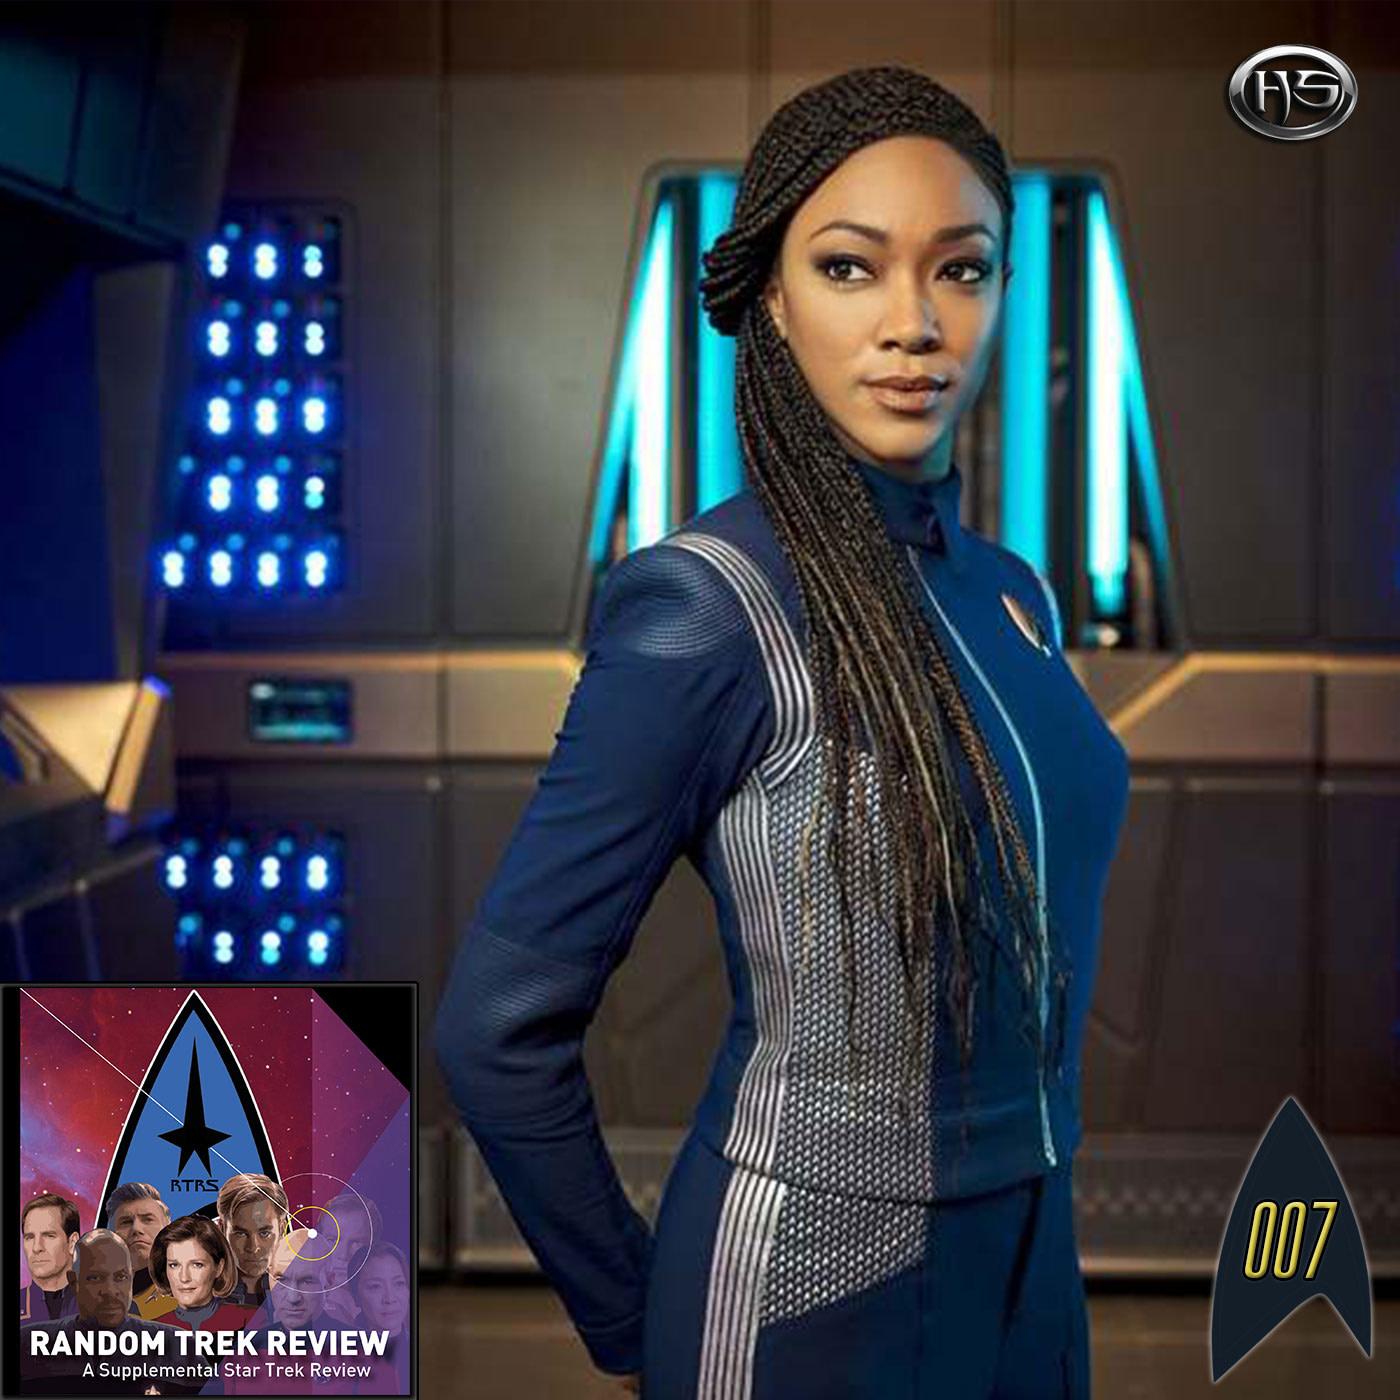 Random Trek Review Supplemental Episode 7